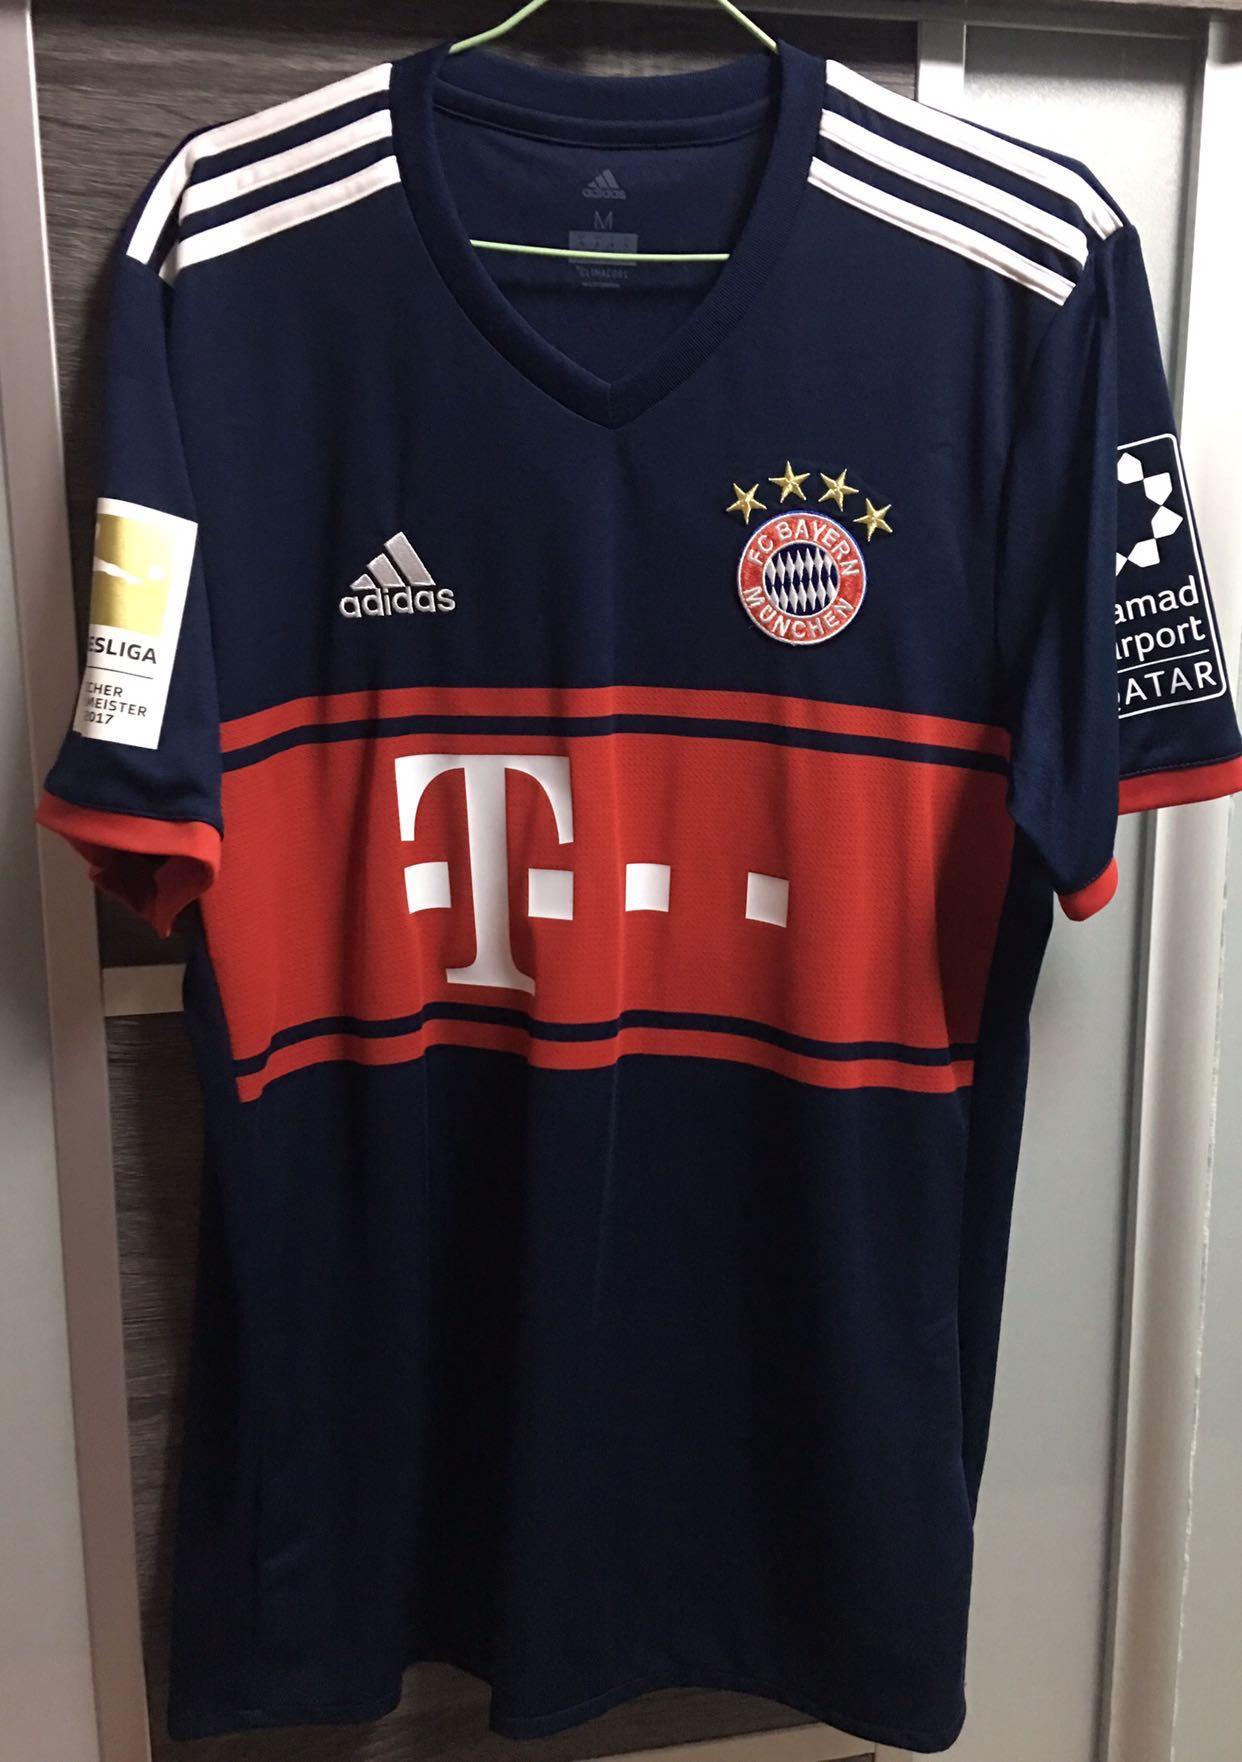 72038f49728 Black Friday) Authentic Bayern Munich 17 18 KIMMICH jersey